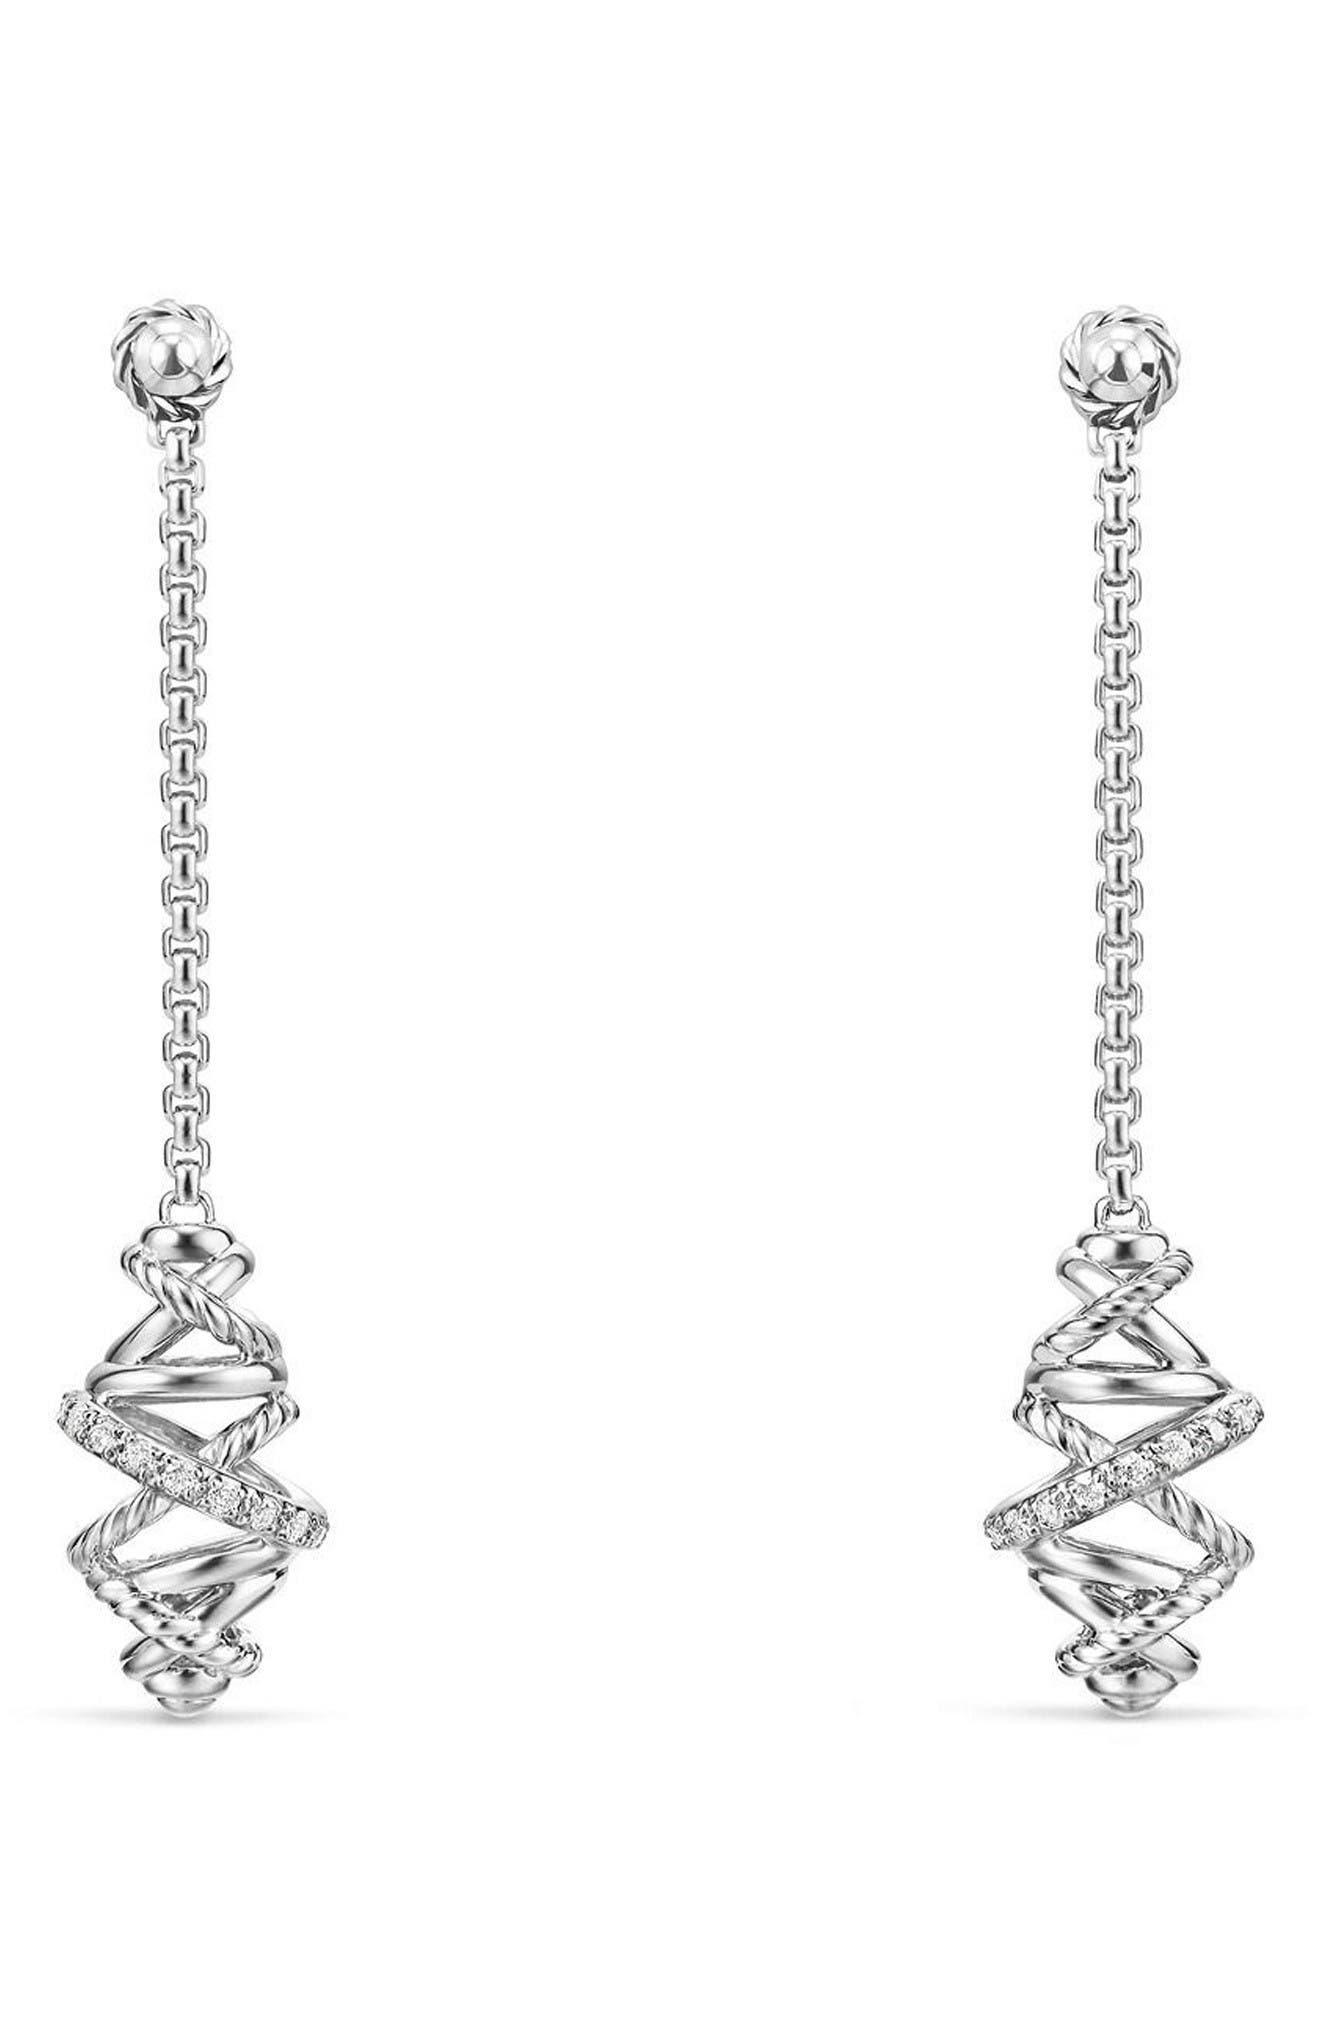 Main Image - David Yurman Crossover Chain Drop Earrings with Diamonds